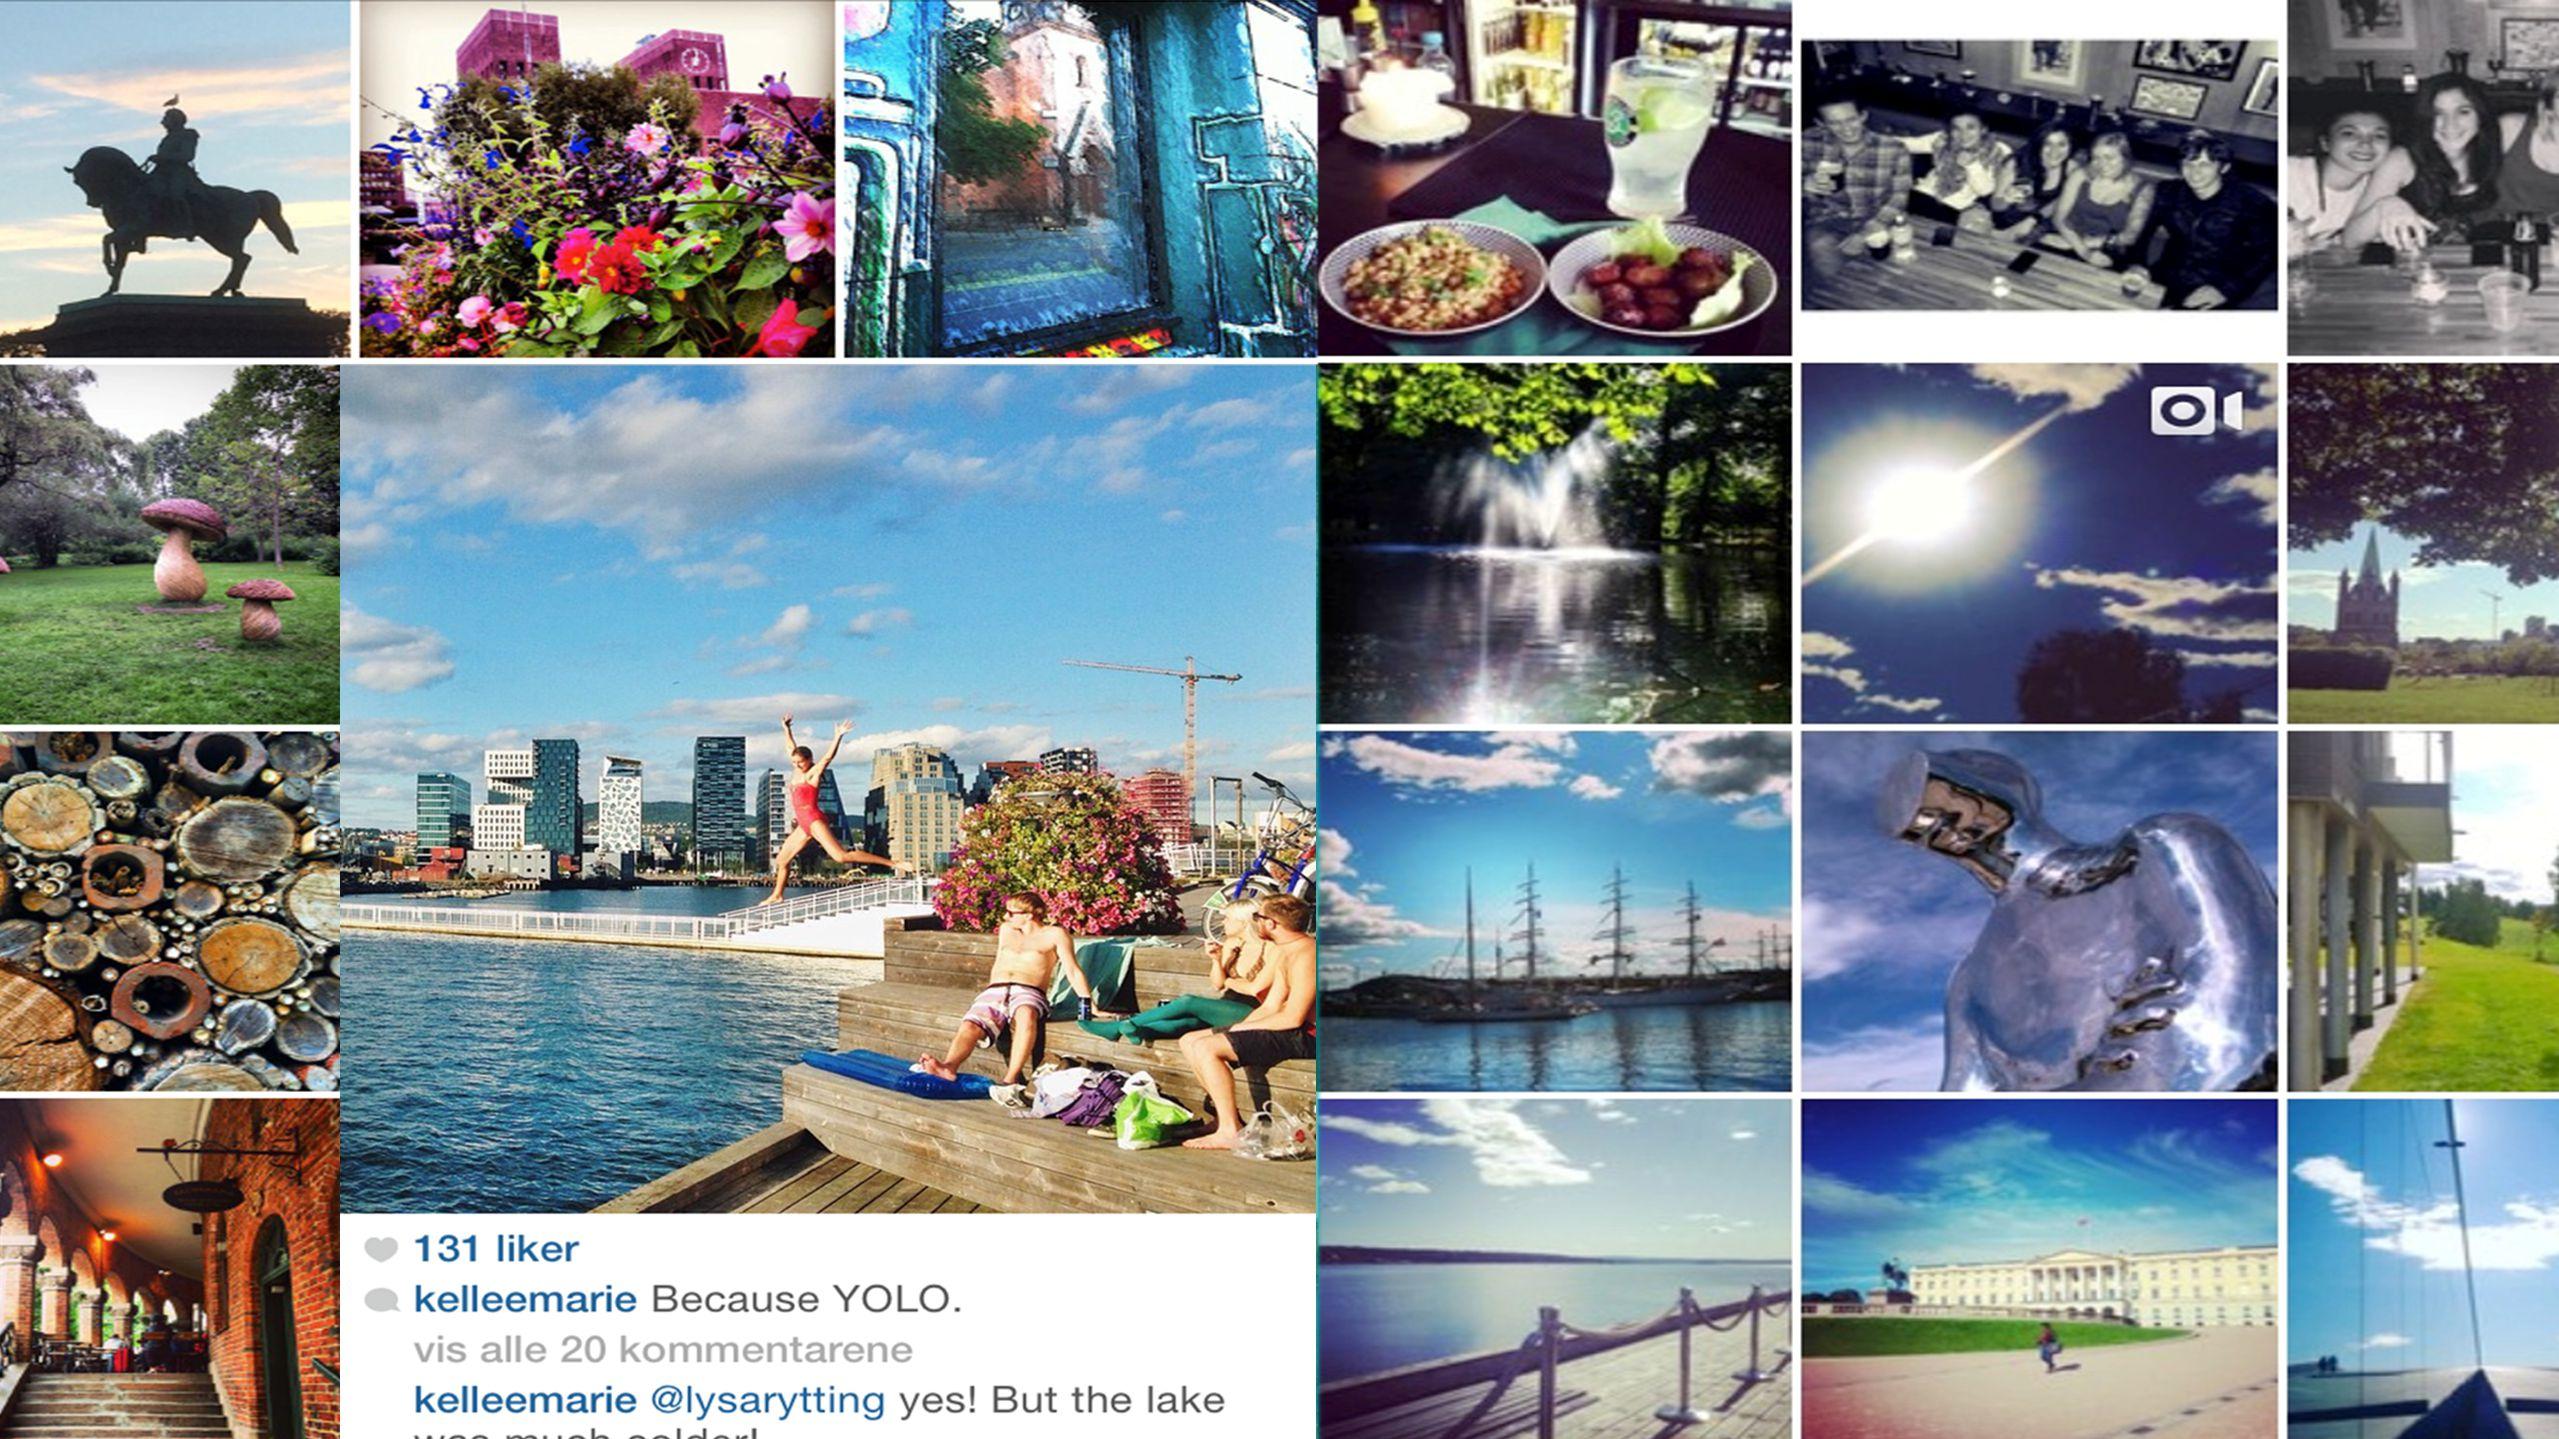 www.visitoslo.com